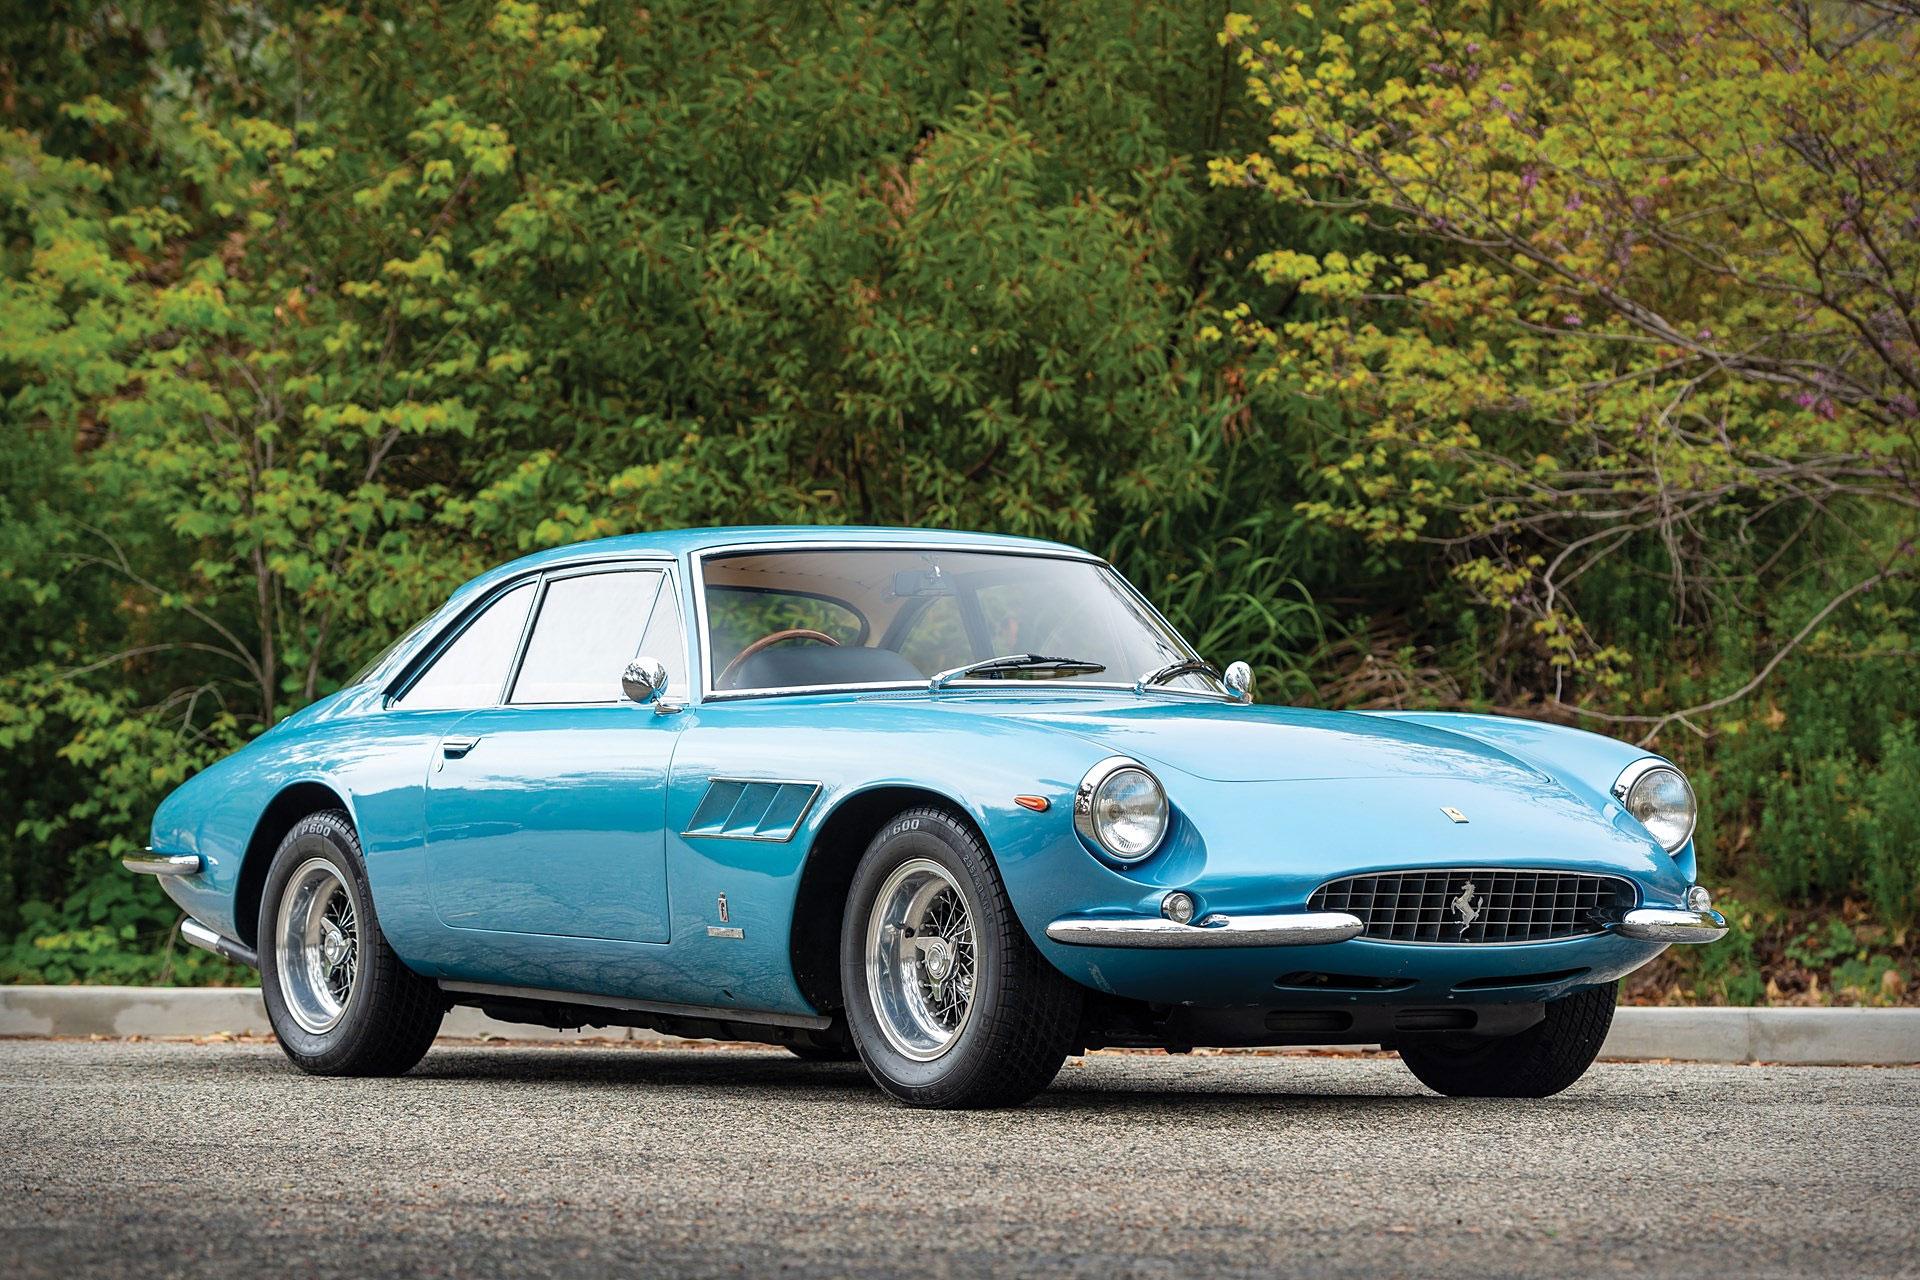 1966 Ferrari 500 Superfast Series II Coupe